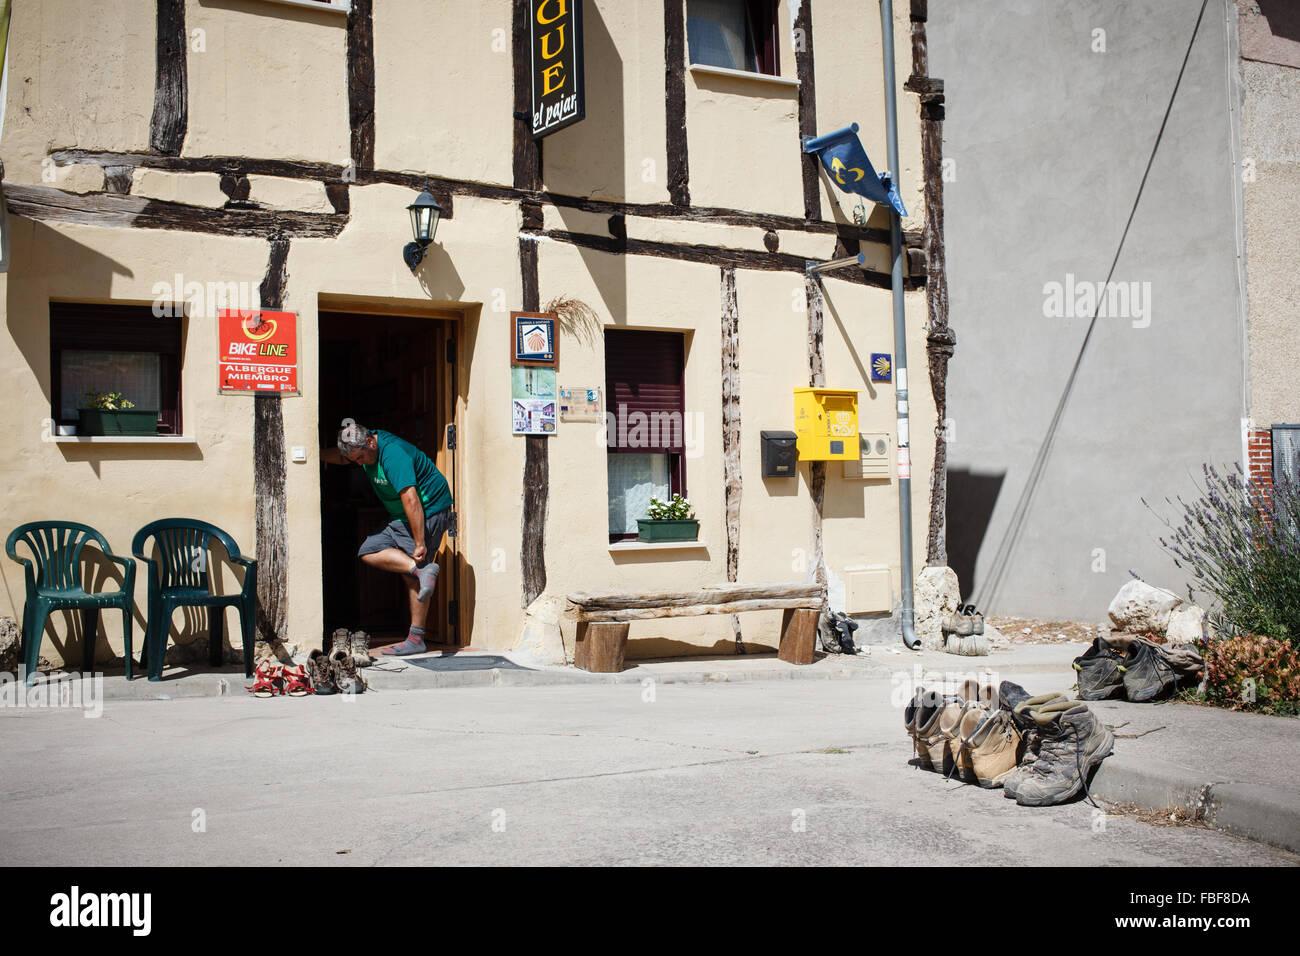 9/9/14 Pilgrim arriving at hostel on Camino de Santiago in Agés, Burgos, Castilla y Leon, Spain - Stock Image